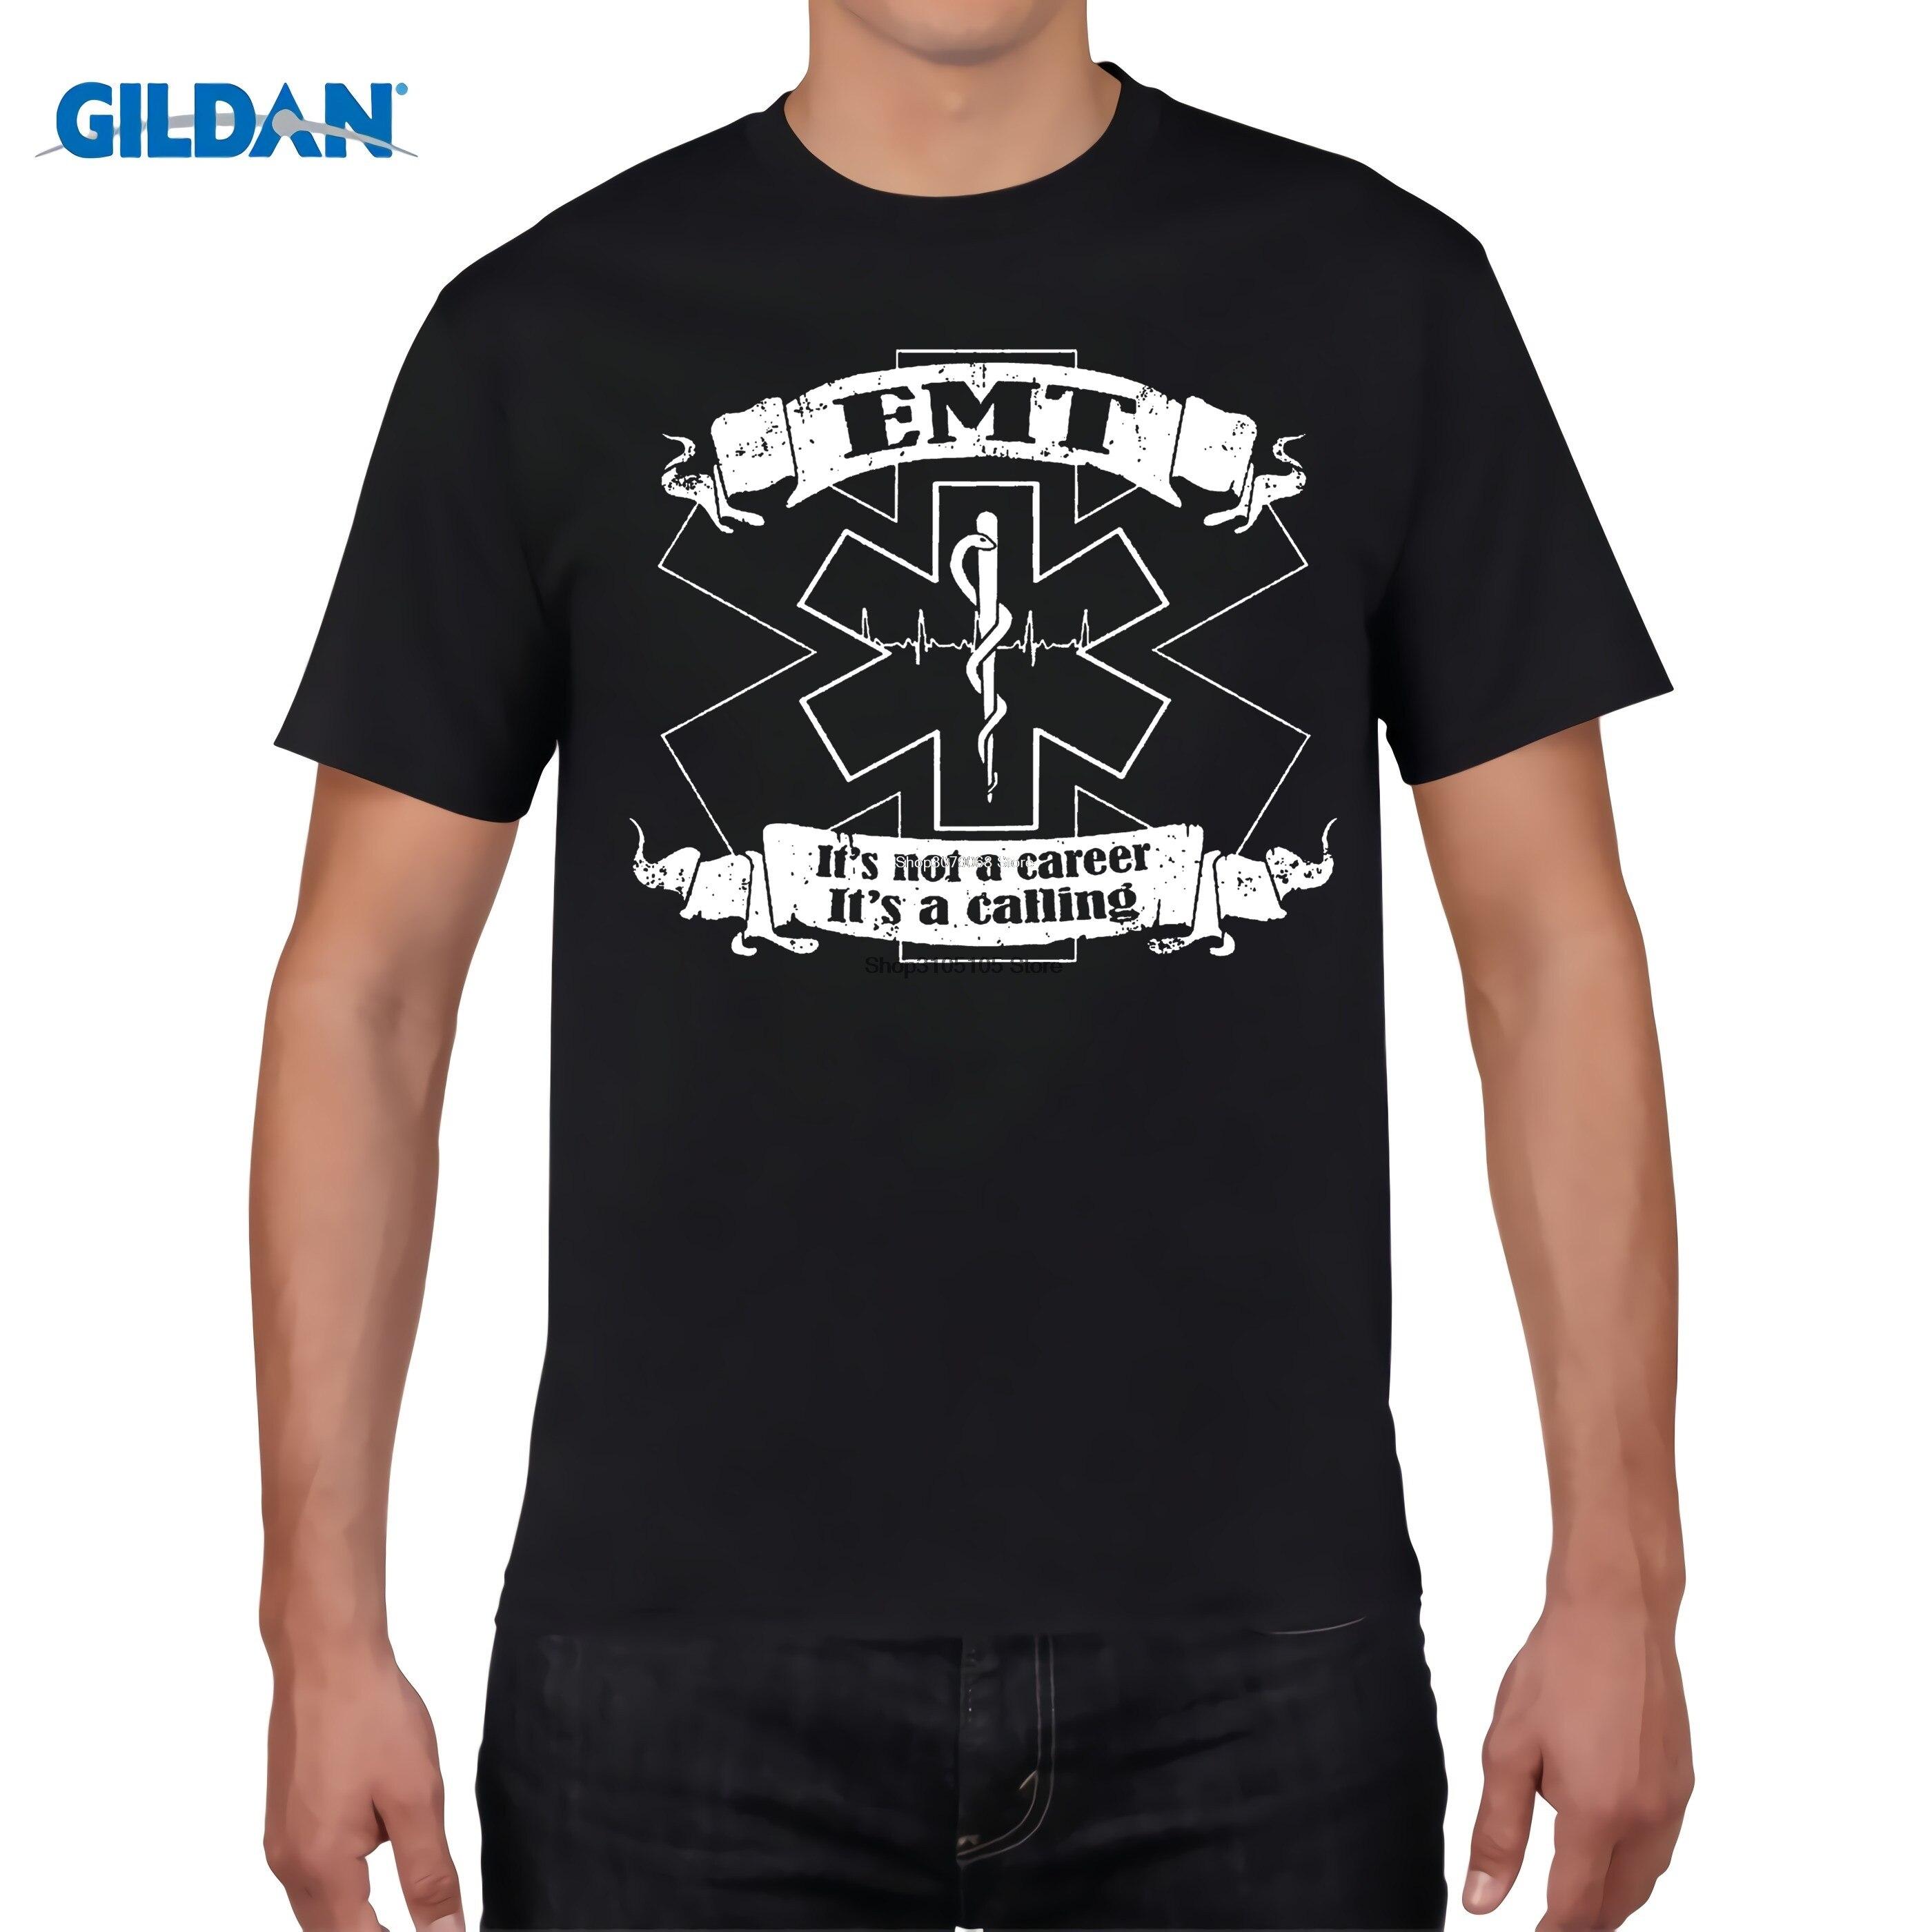 GILDAN designer t shirt Good Quality Cotton T Shirt Men EMT Shirt Emergency Medical Technician EMS Star Of Life Tee Shirts